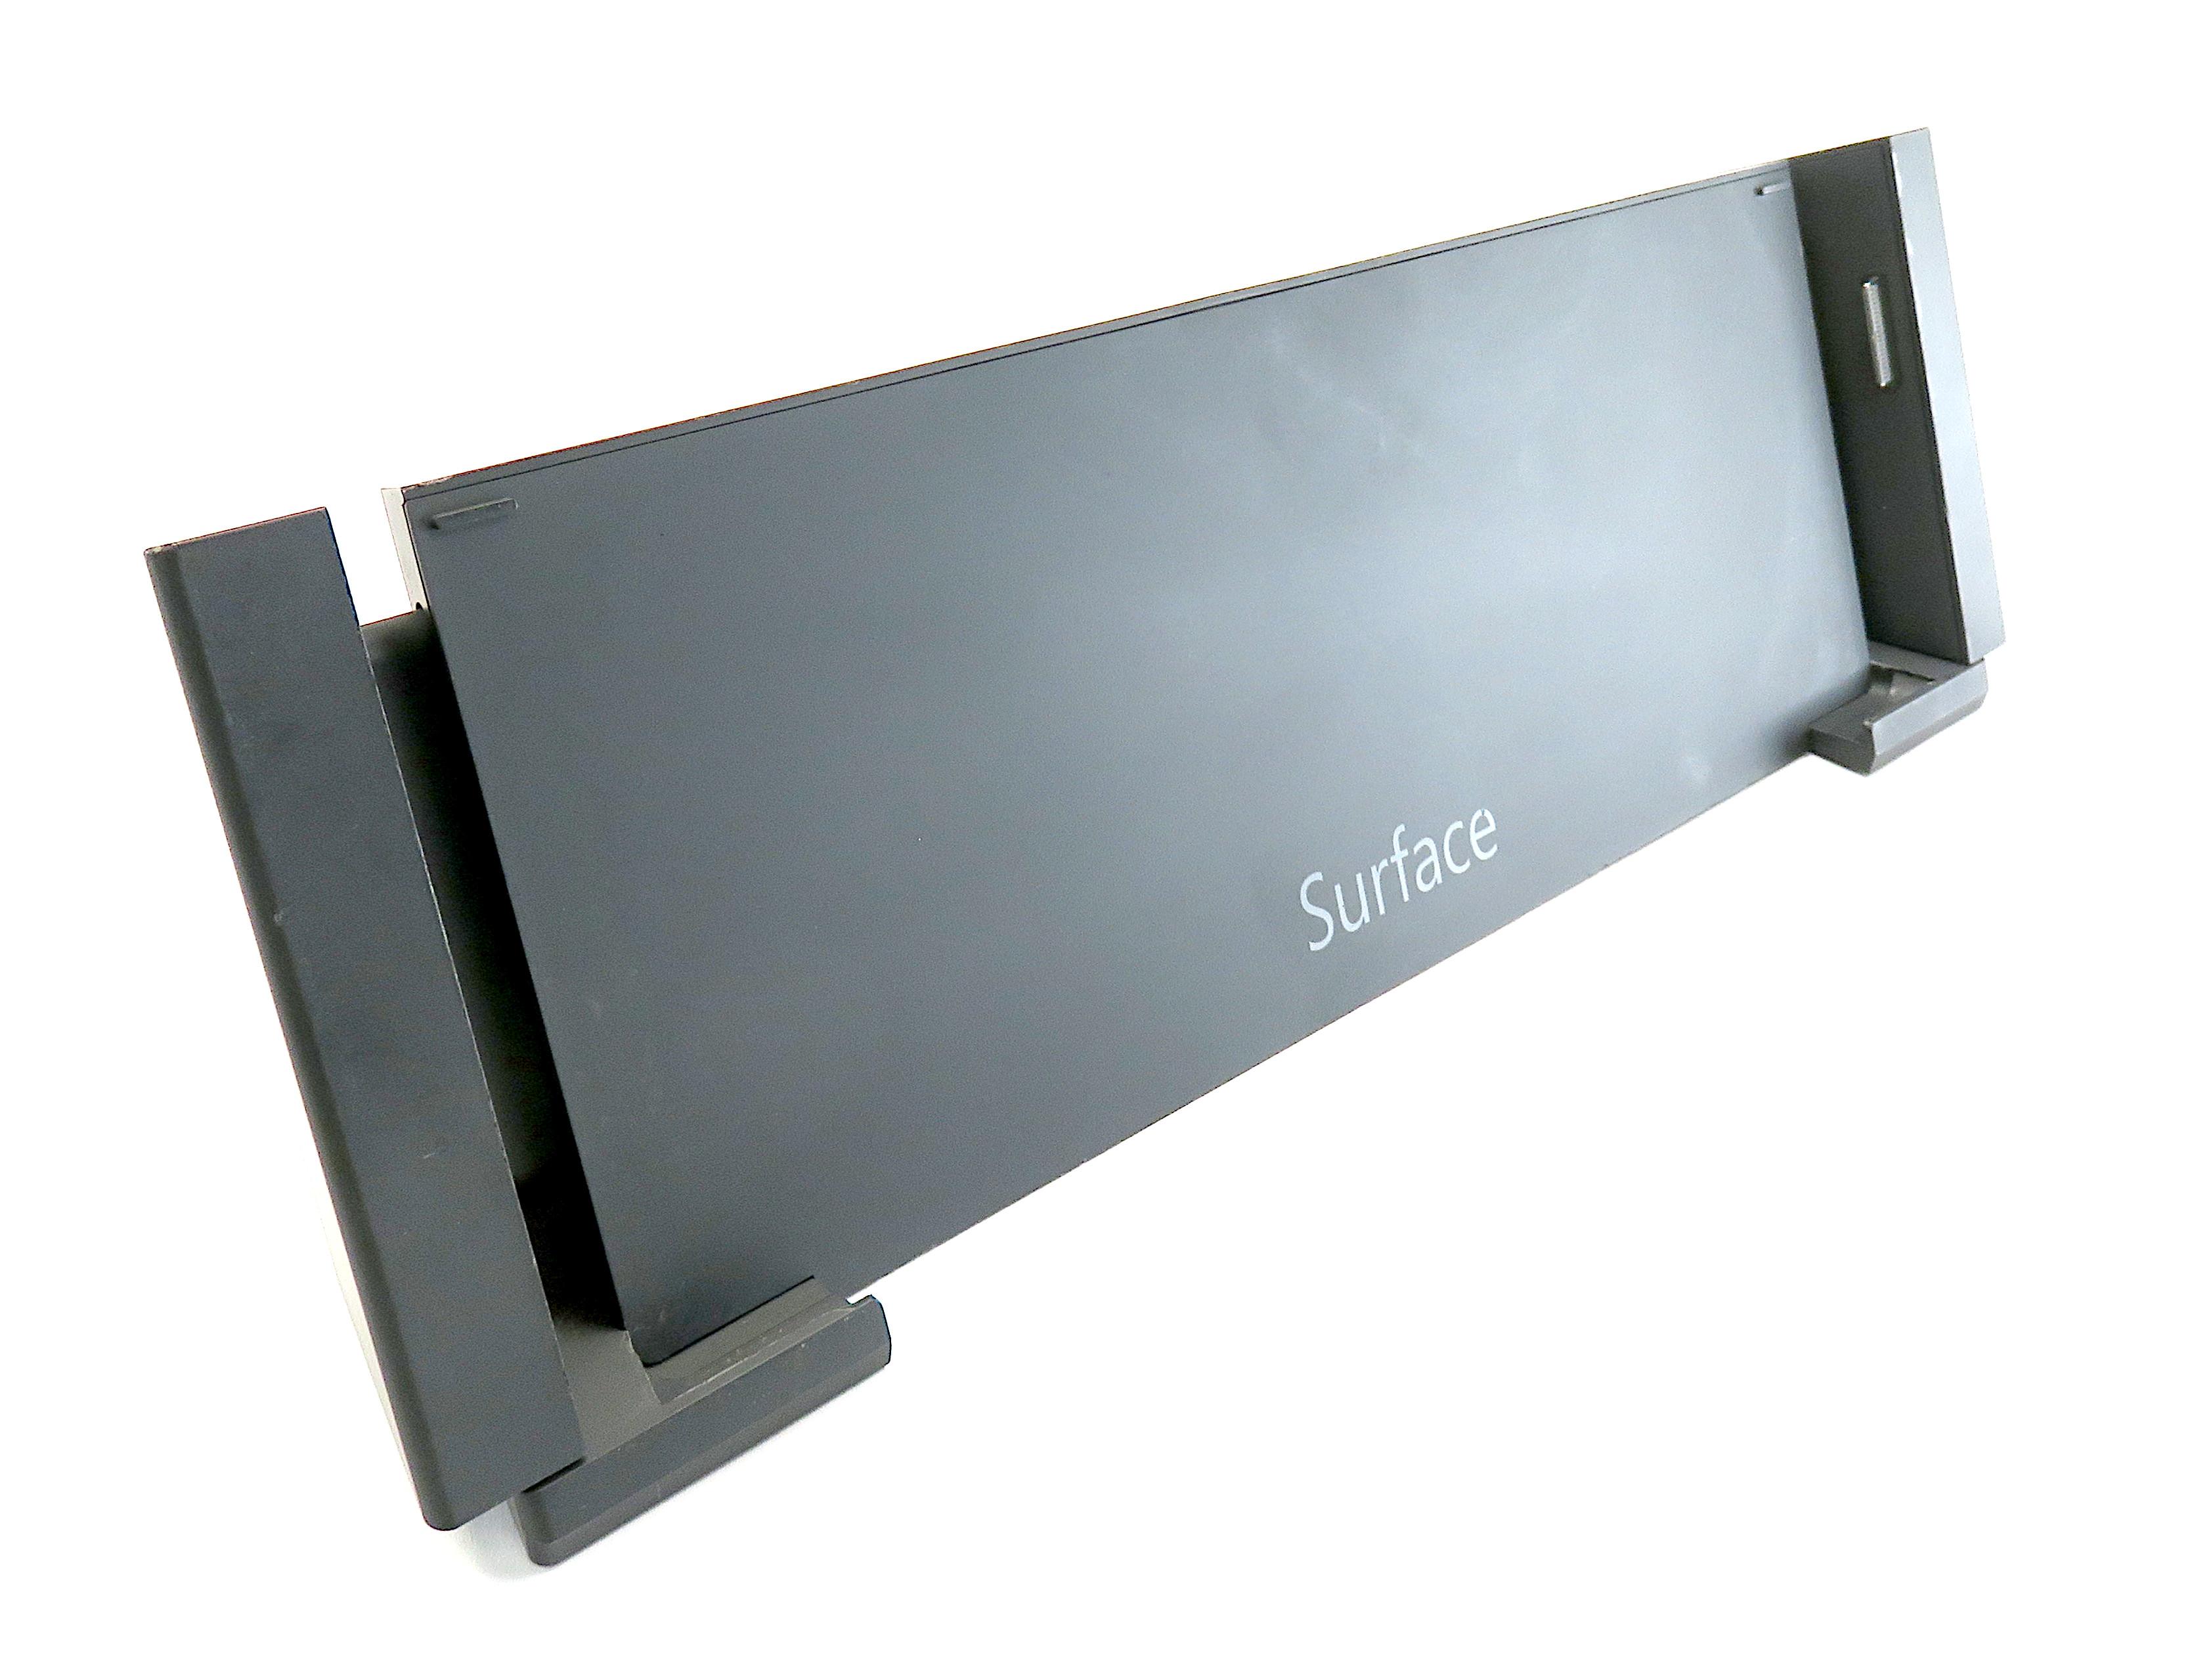 Microsoft Surface Pro 3 Docking Station Model #1664 No PSU